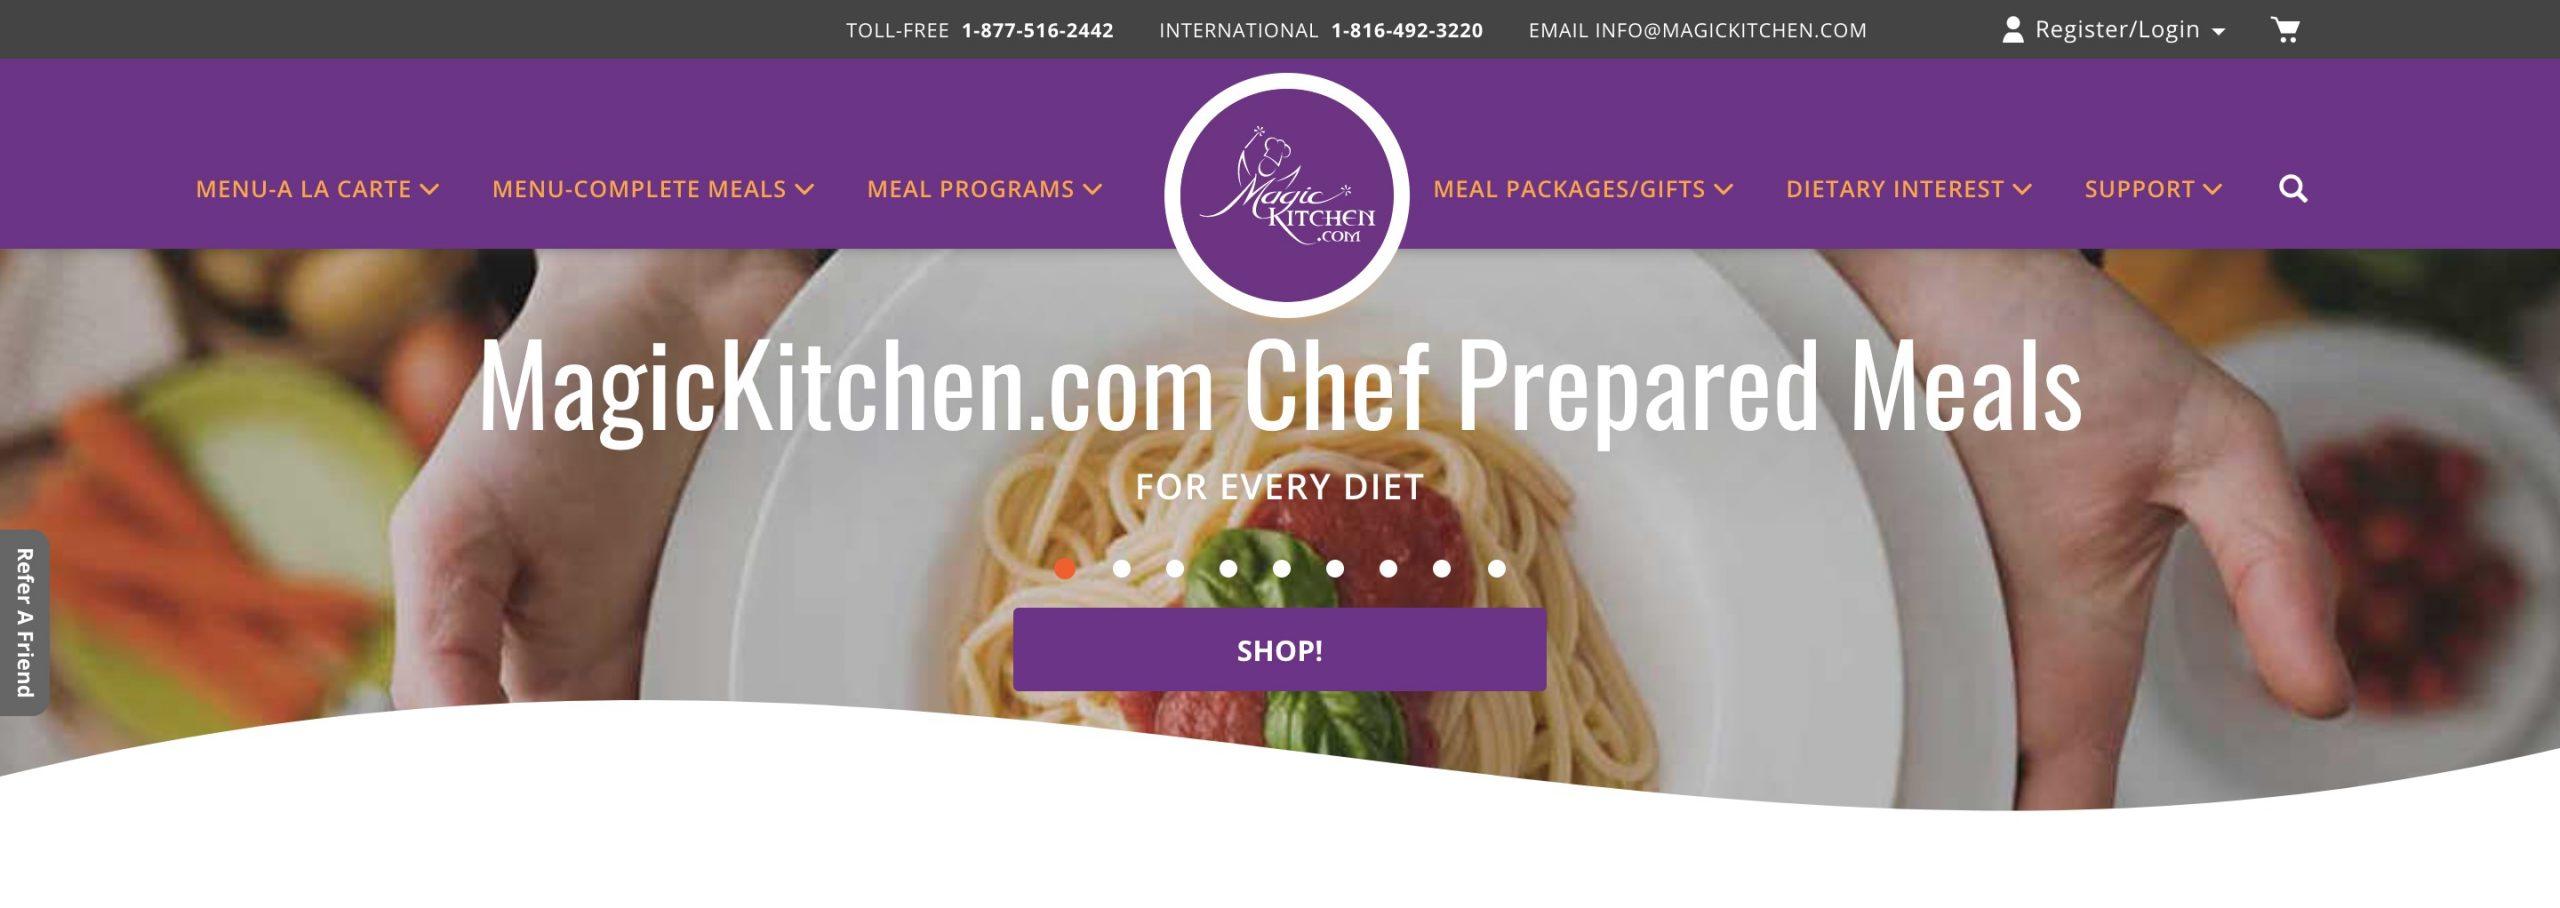 Magic Kitchen main page